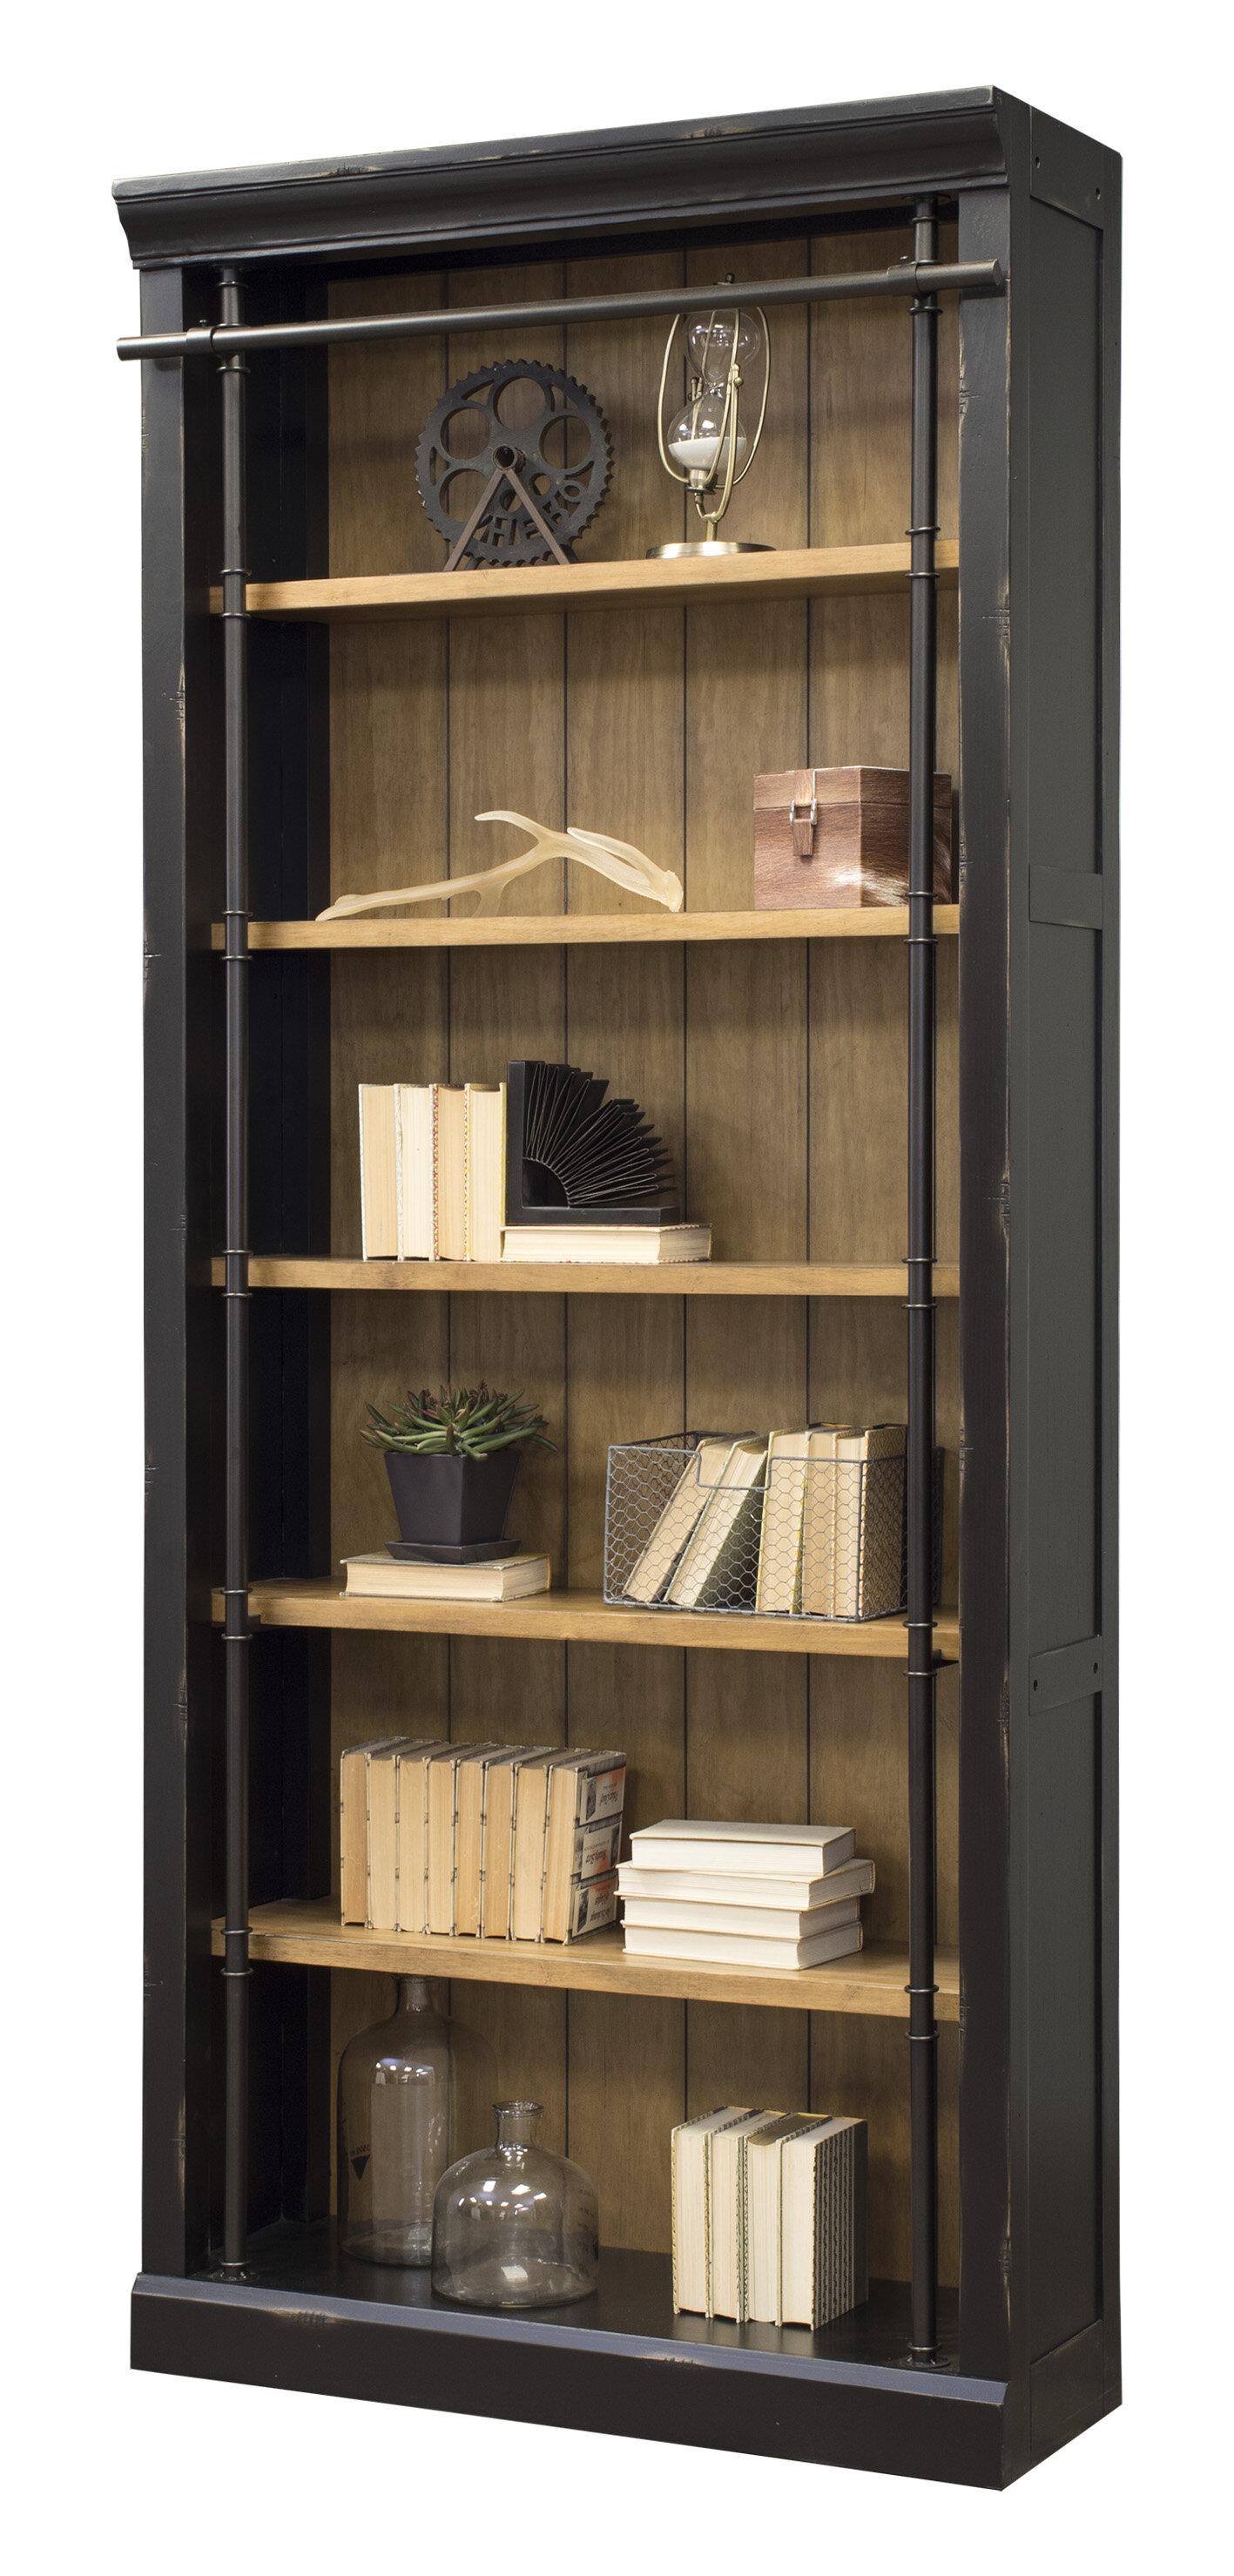 Marilee 94 H X 40 W Standard Bookcase Reviews Birch Lane